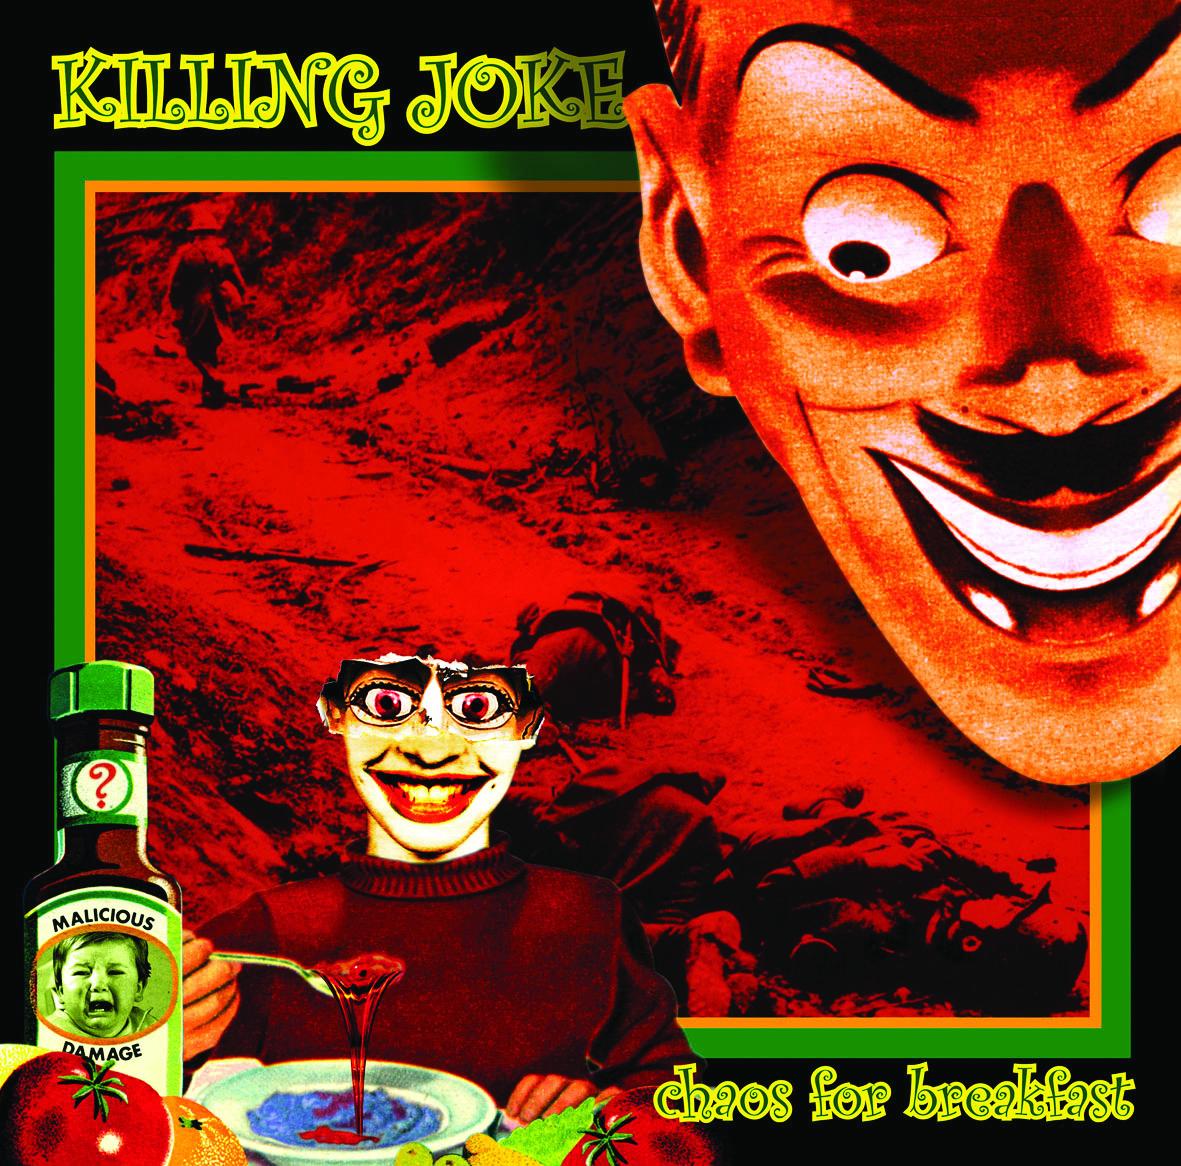 Chaos For Breakfast 5x CD Set - Killing Joke